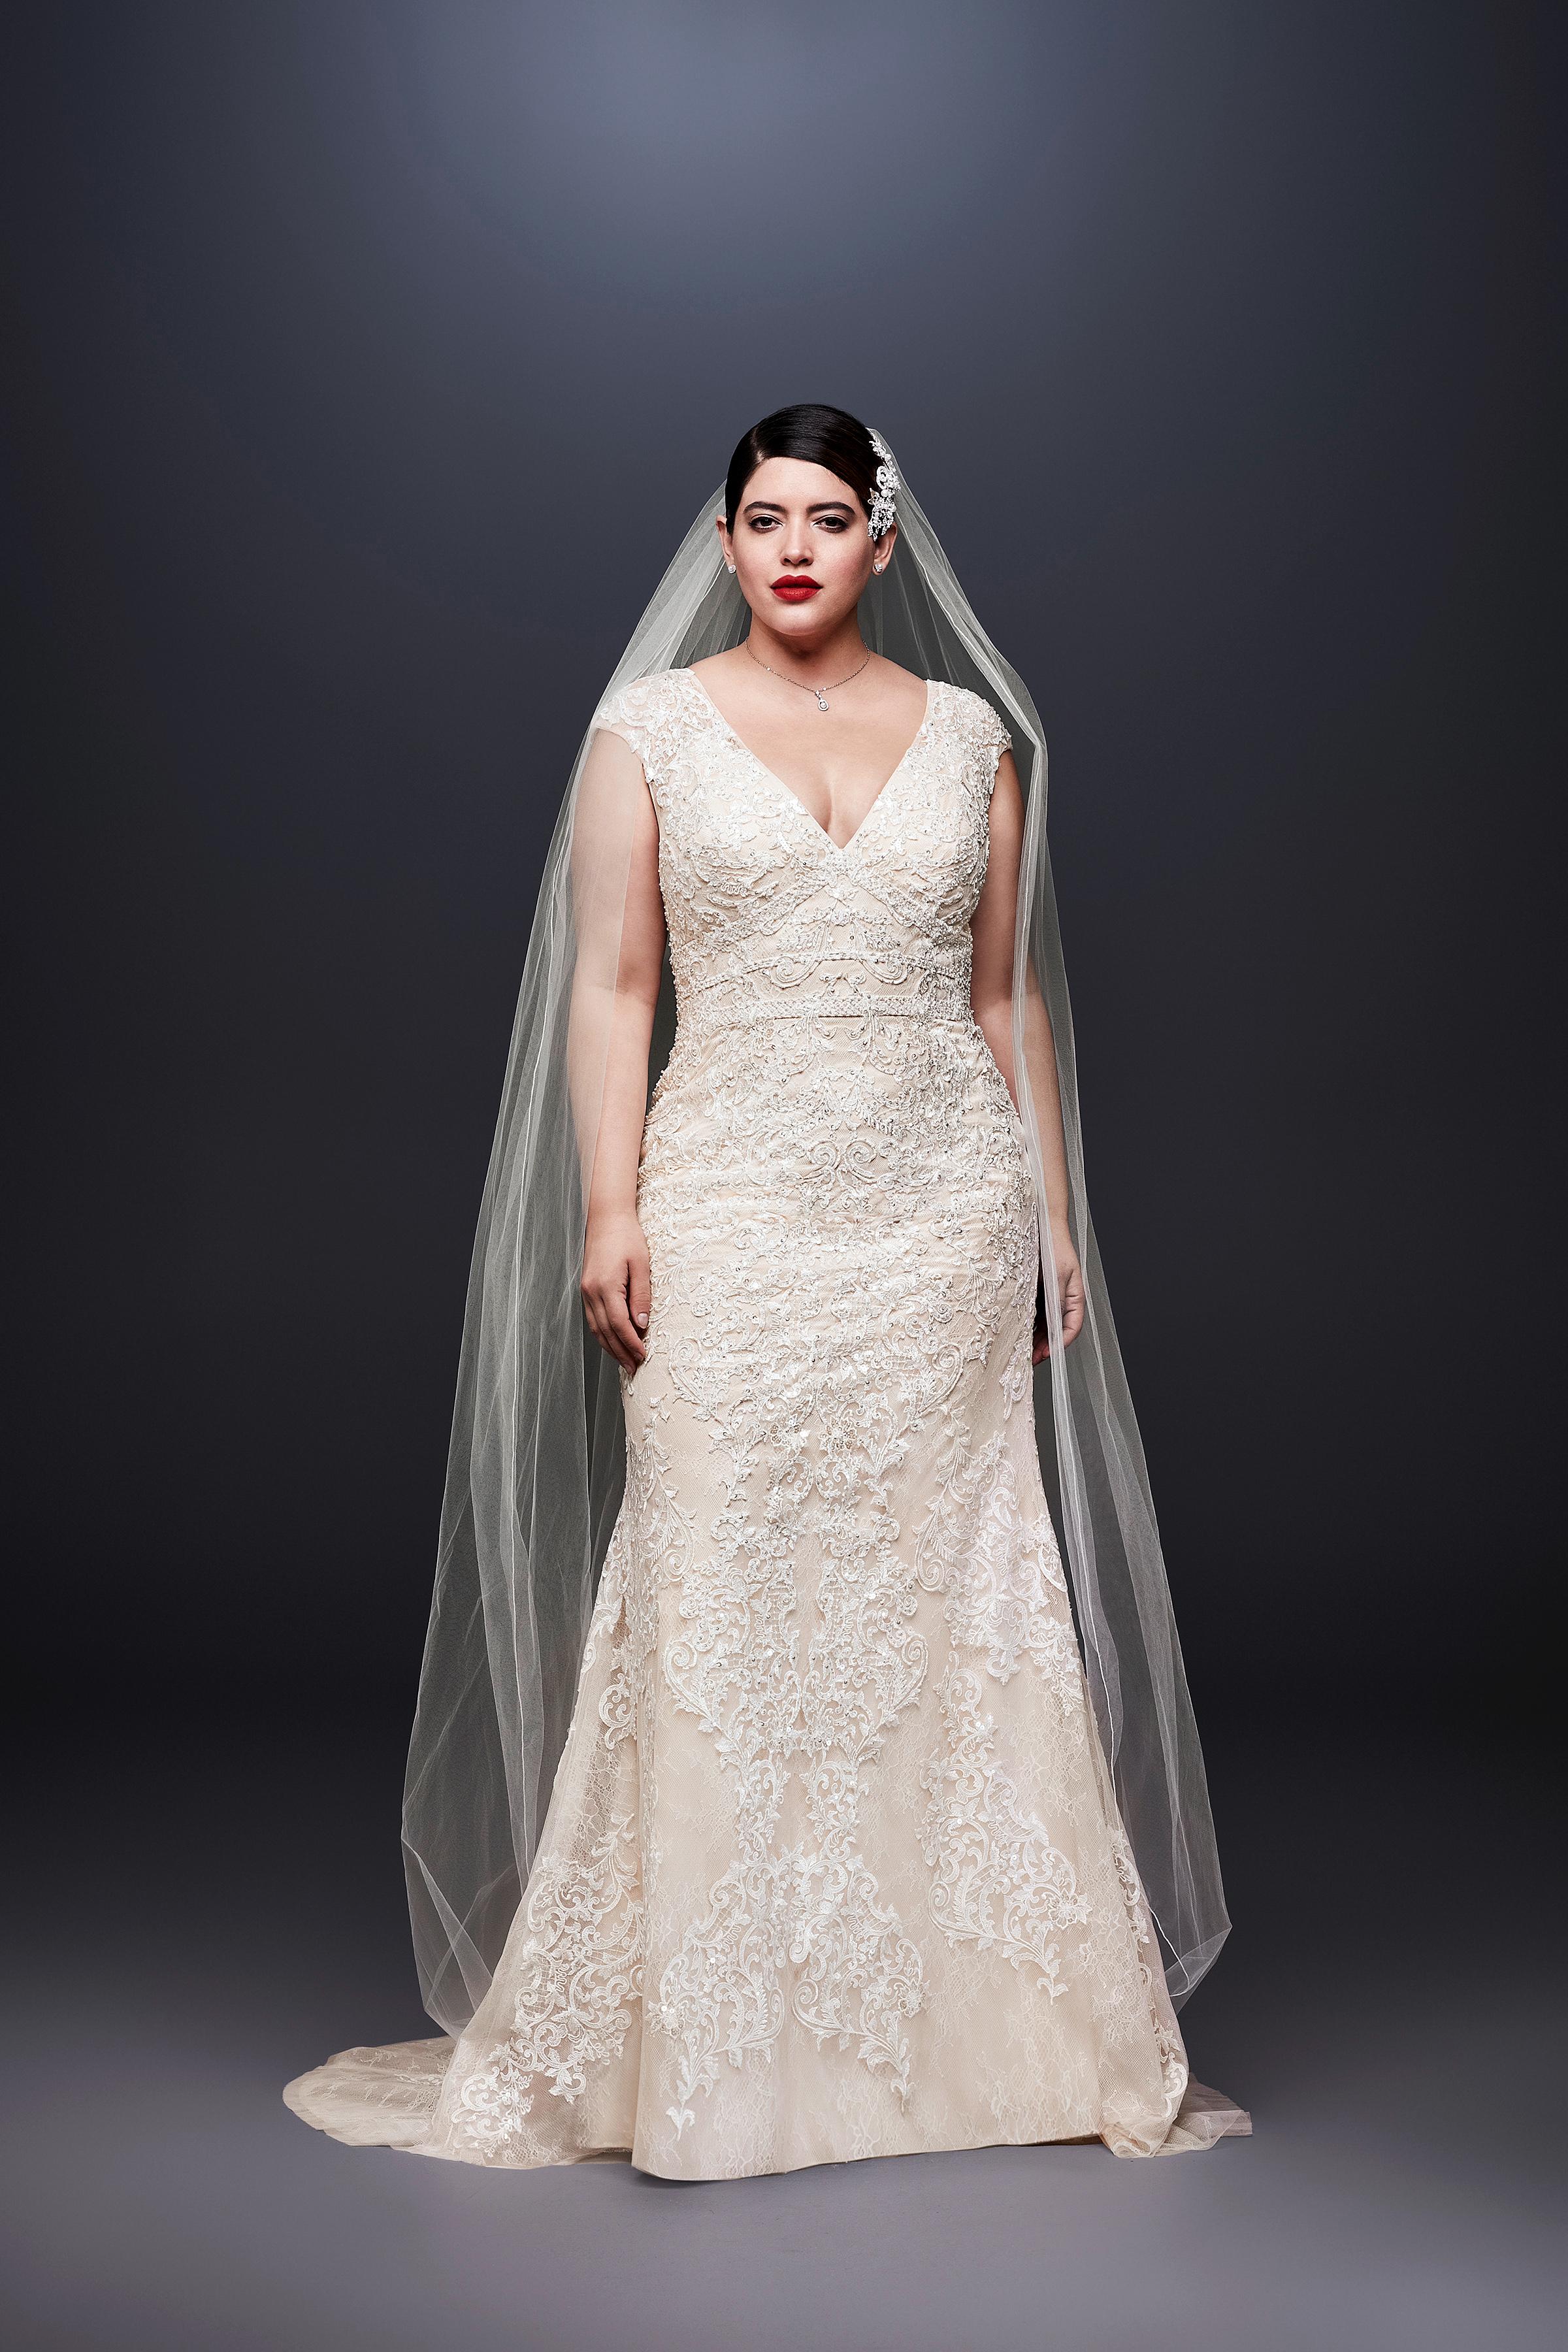 david bridal wedding dress spring 2019 lace cap sleeves v-neck